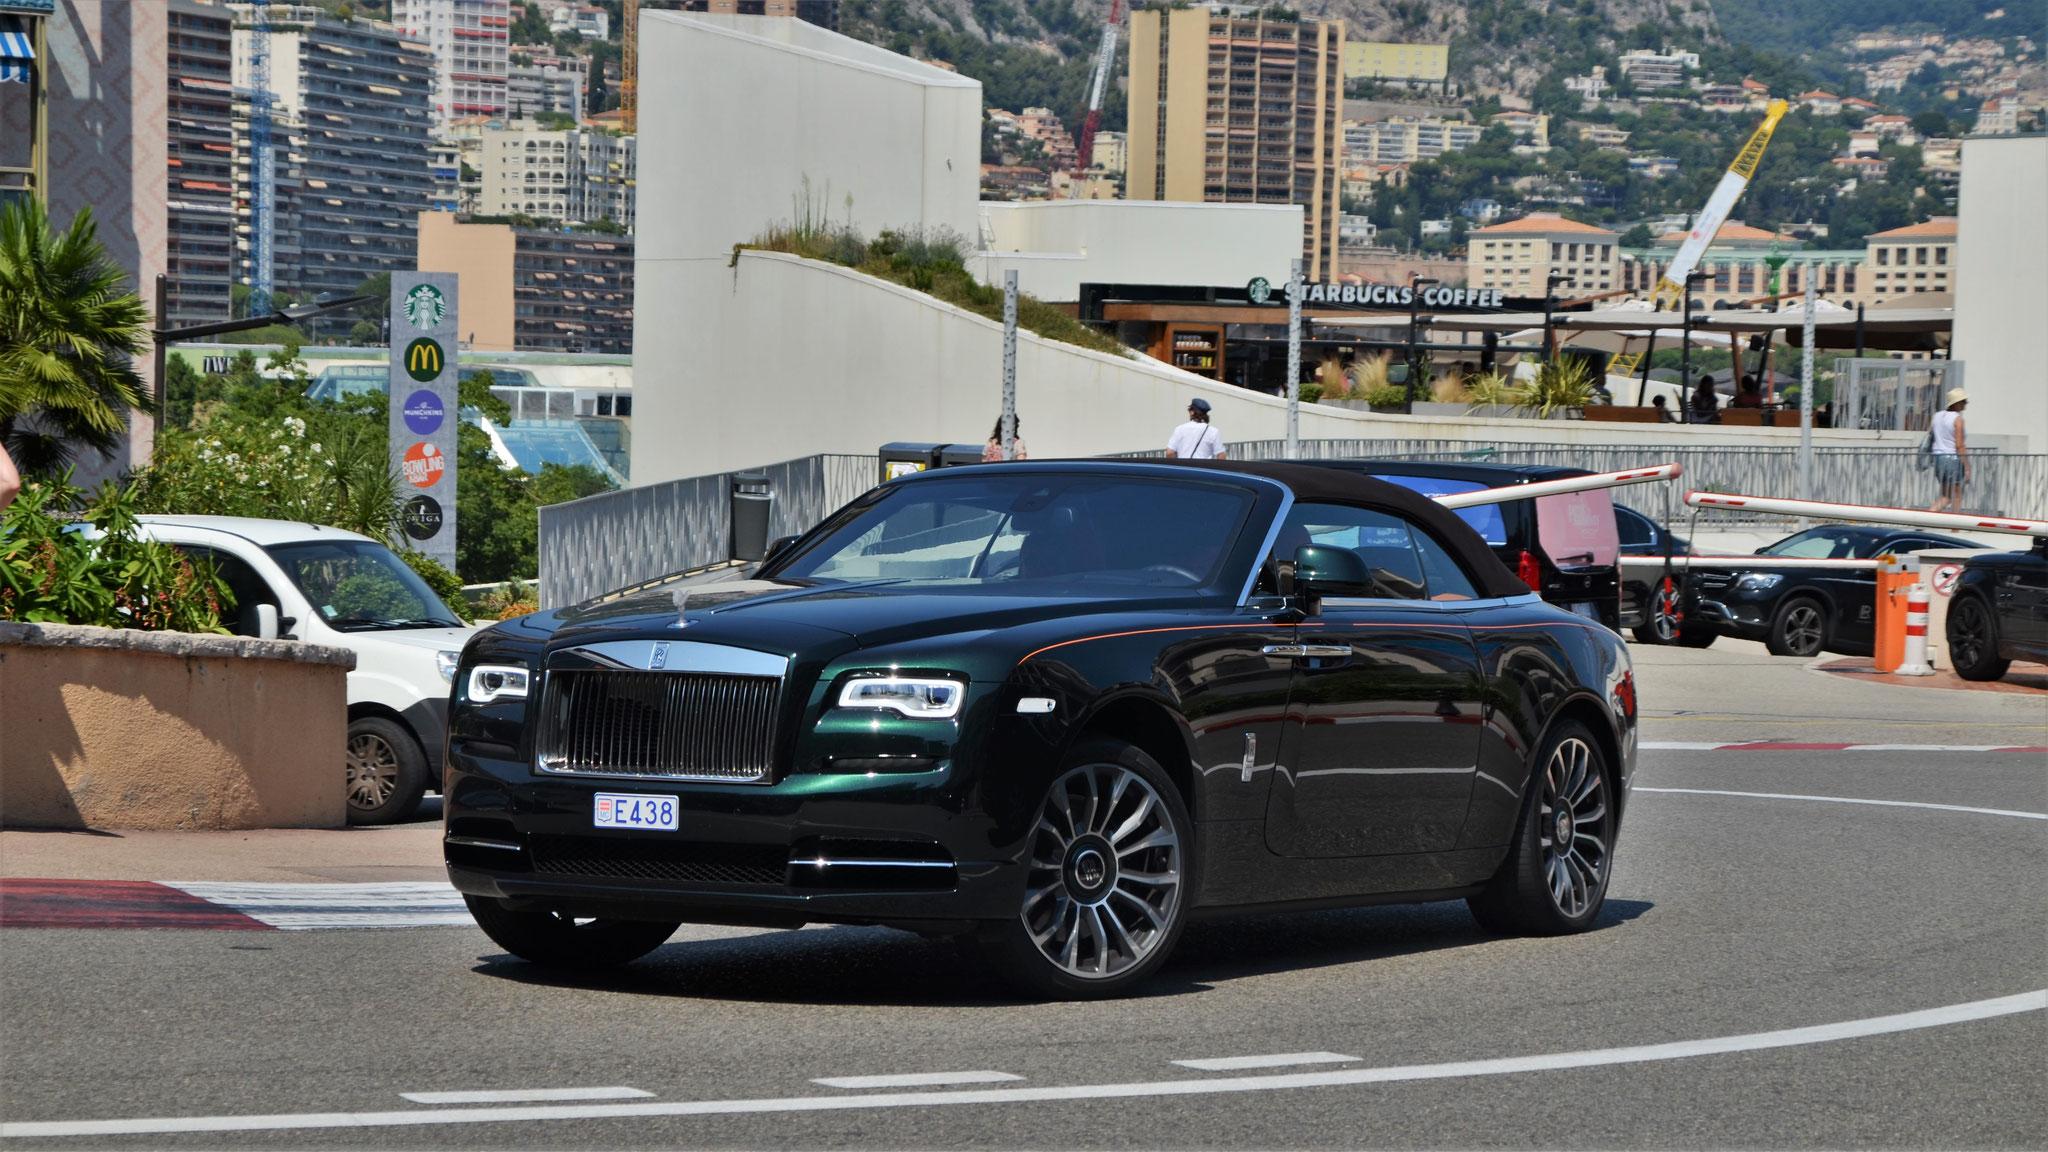 Rolls Royce Dawn - E438 (MC)